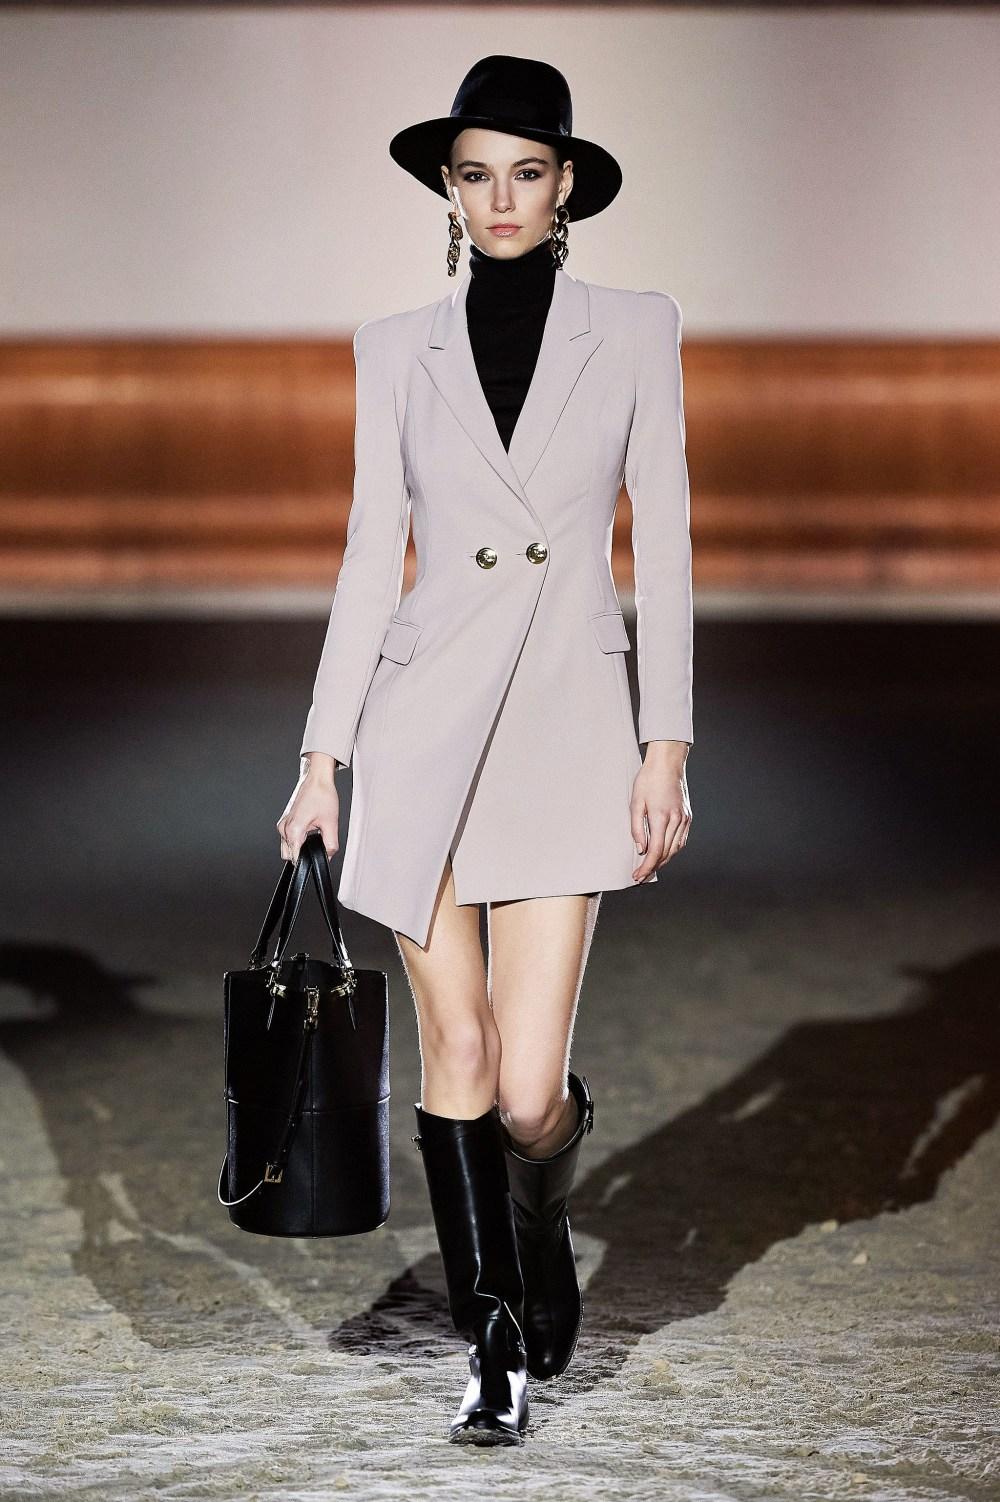 Elisabetta Franchi: Elisabetta Franchi Fall Winter 2021-22 Fashion Show Photo #32